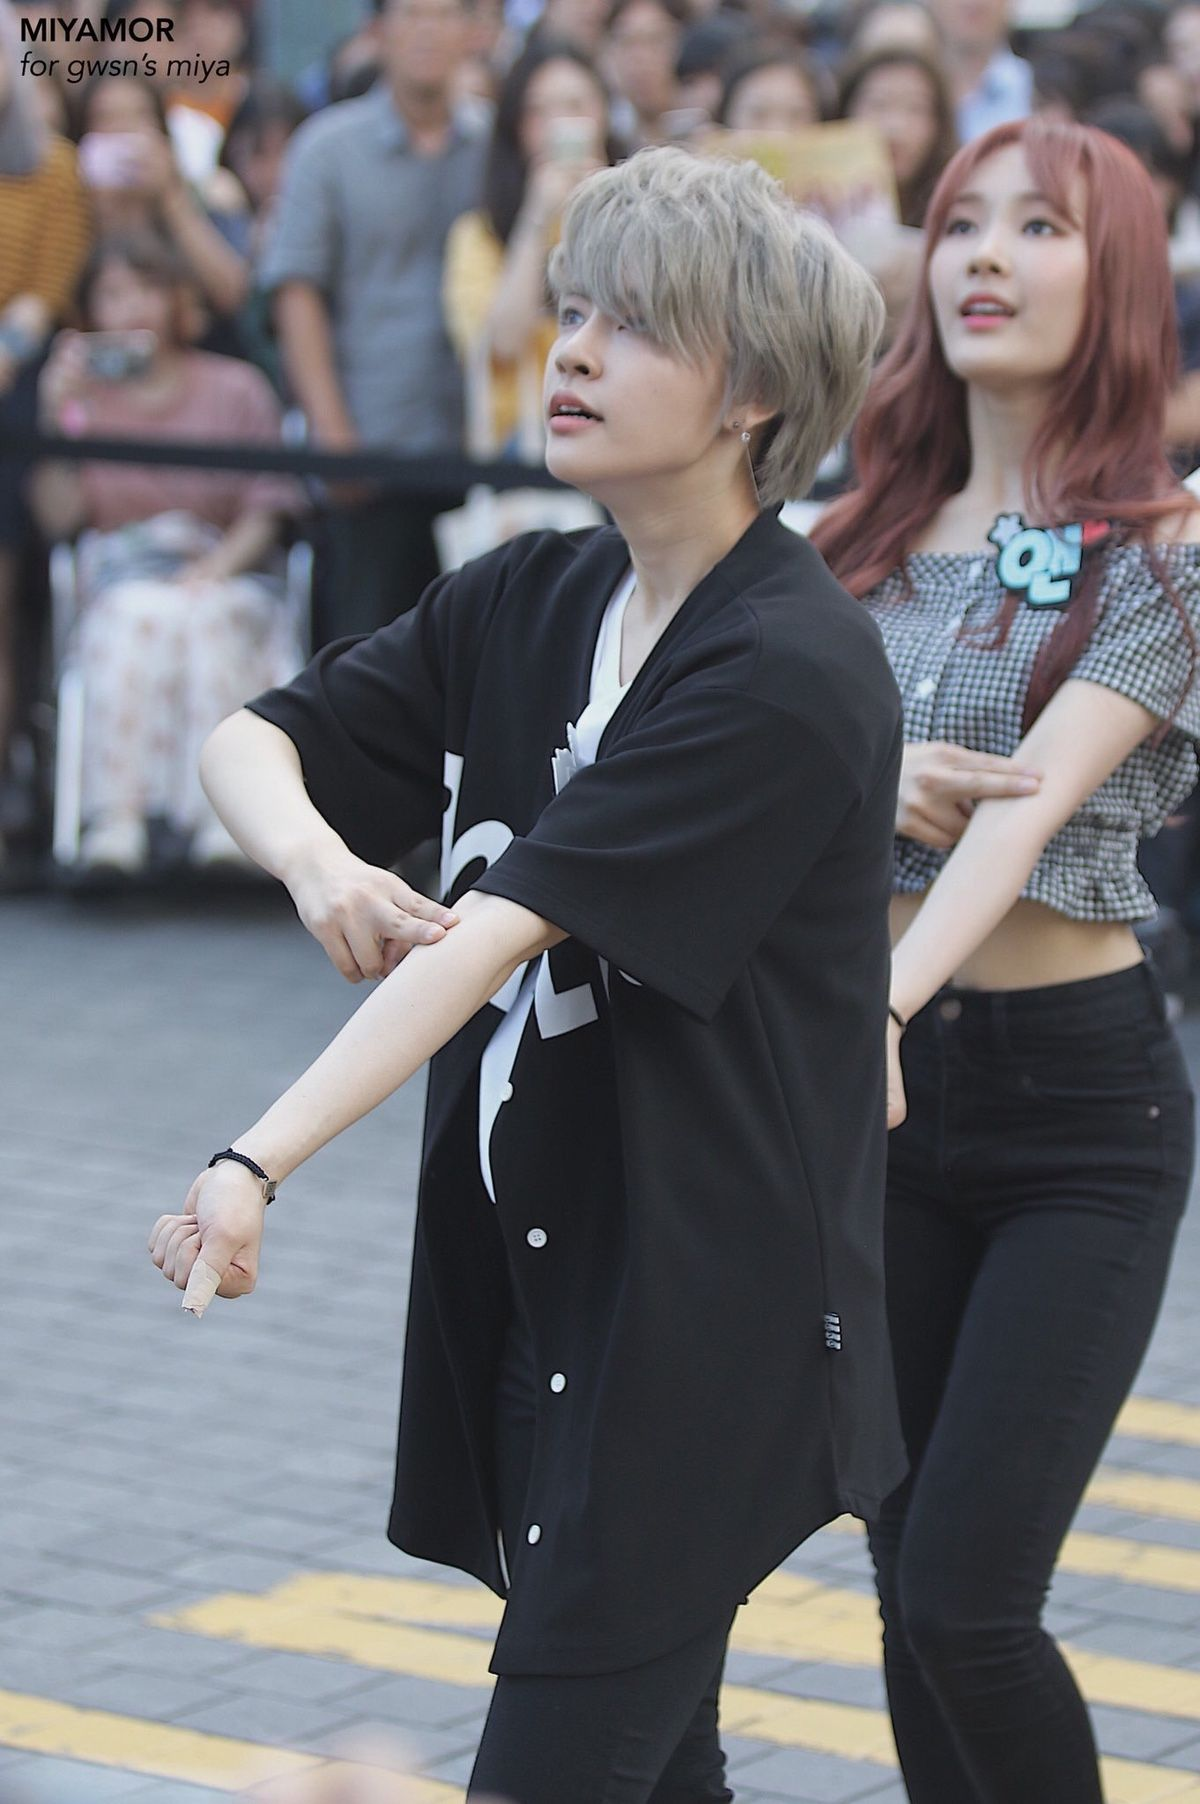 Netizens Think GWSN Miya Looks Like A Cosplay Fan And Not An Idol